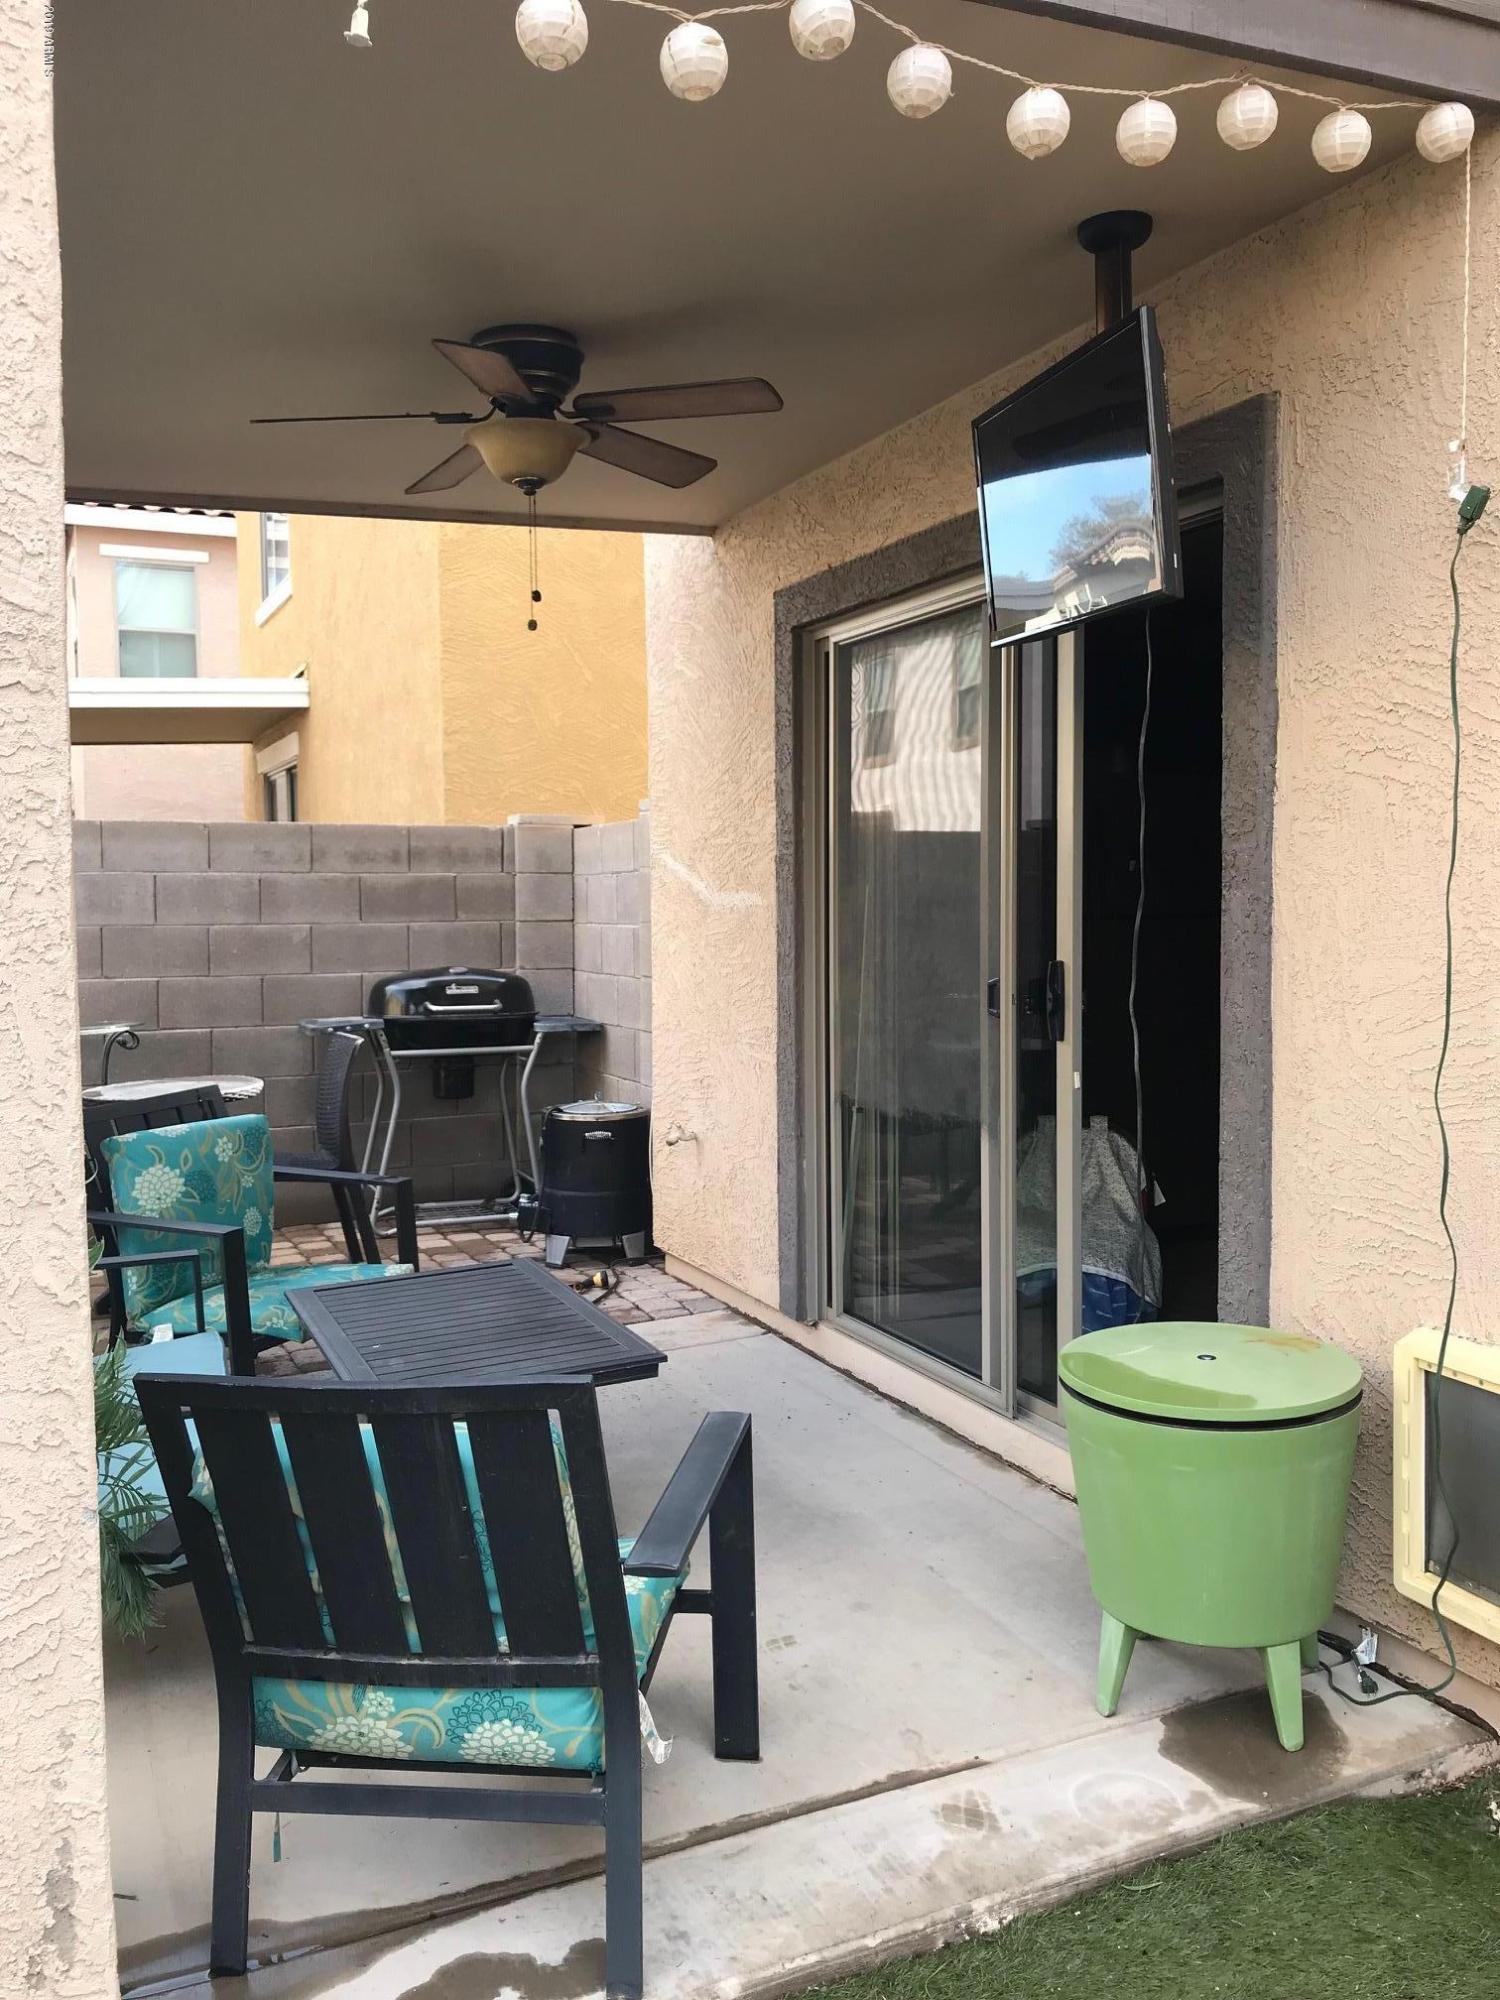 MLS 5870358 6422 W CONSTANCE Way, Laveen, AZ 85339 Laveen AZ Avalon Village